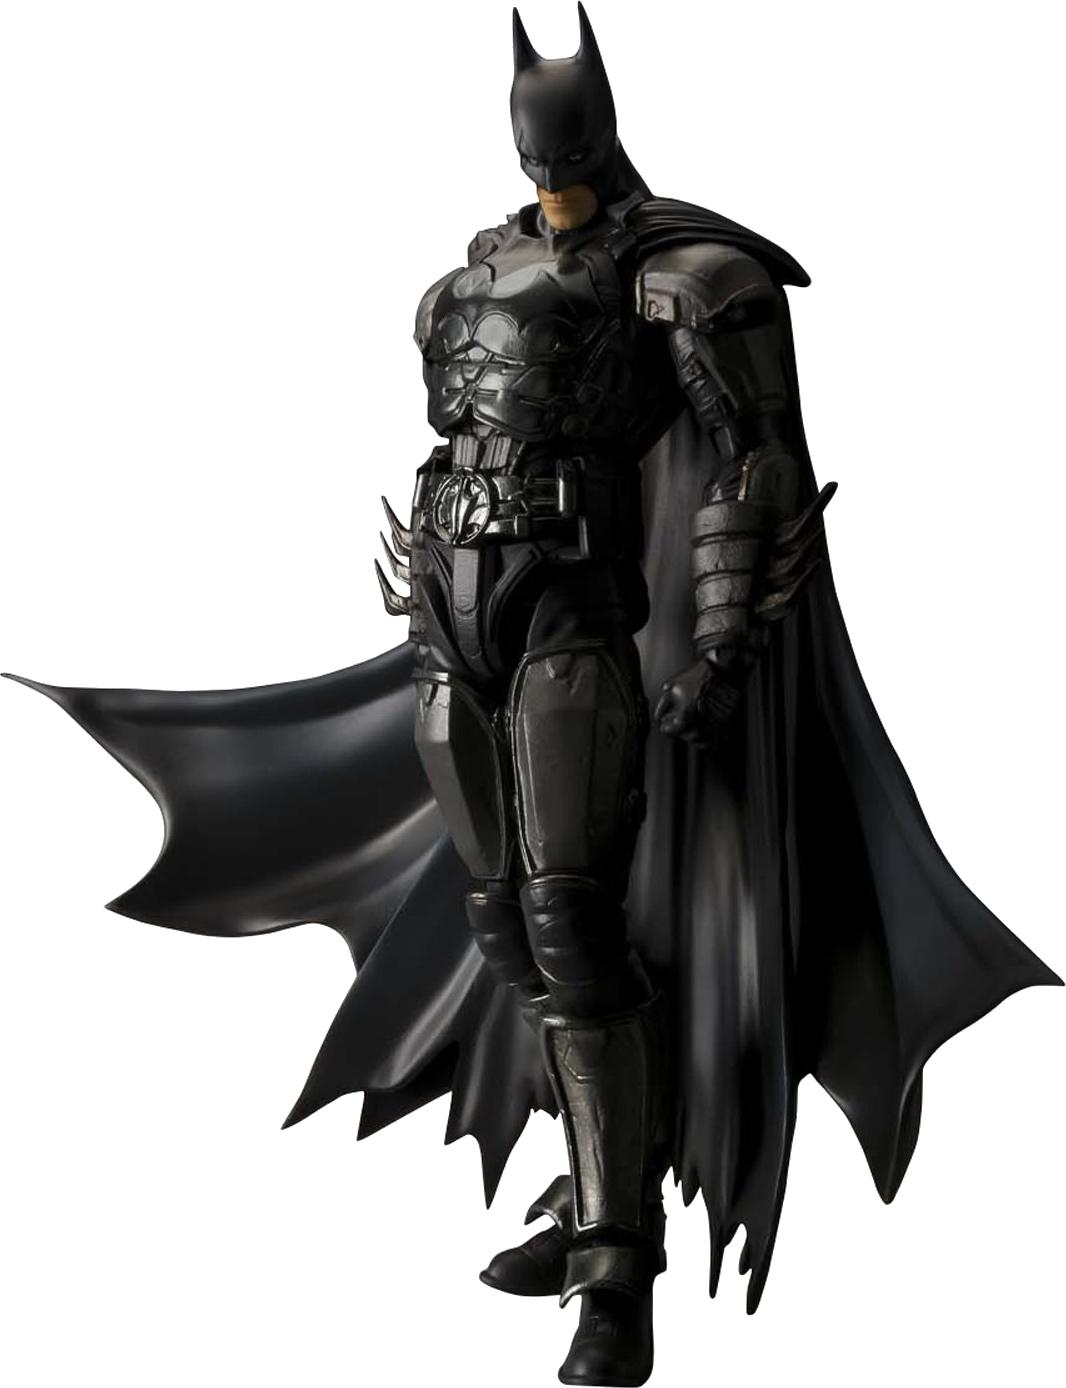 Batman Batman Injustice Batman Batman Toys